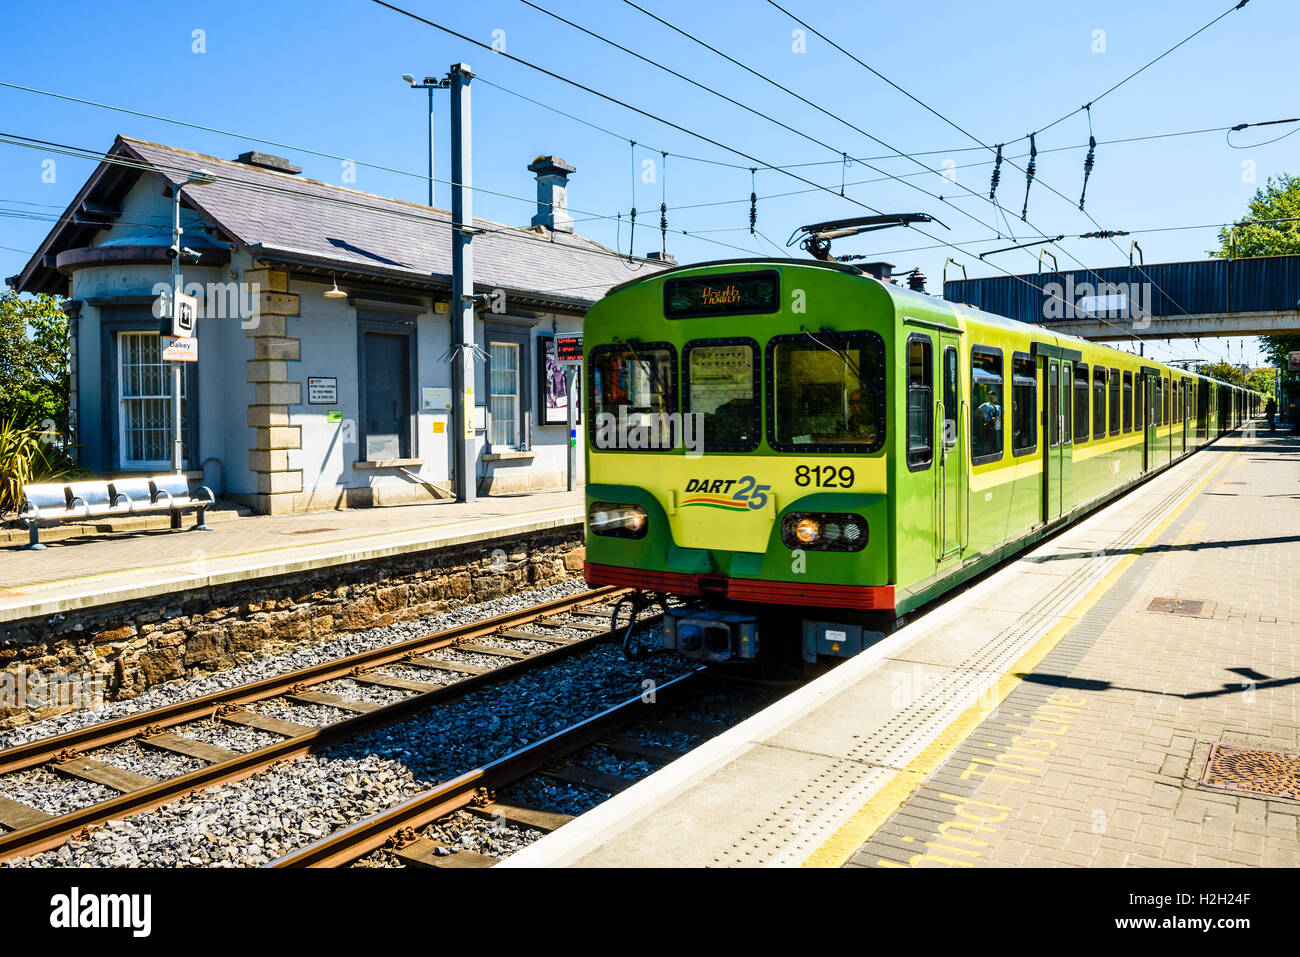 DART (Dublin Area Rapid Transit) train at Bray station near Dublin Ireland - Stock Image